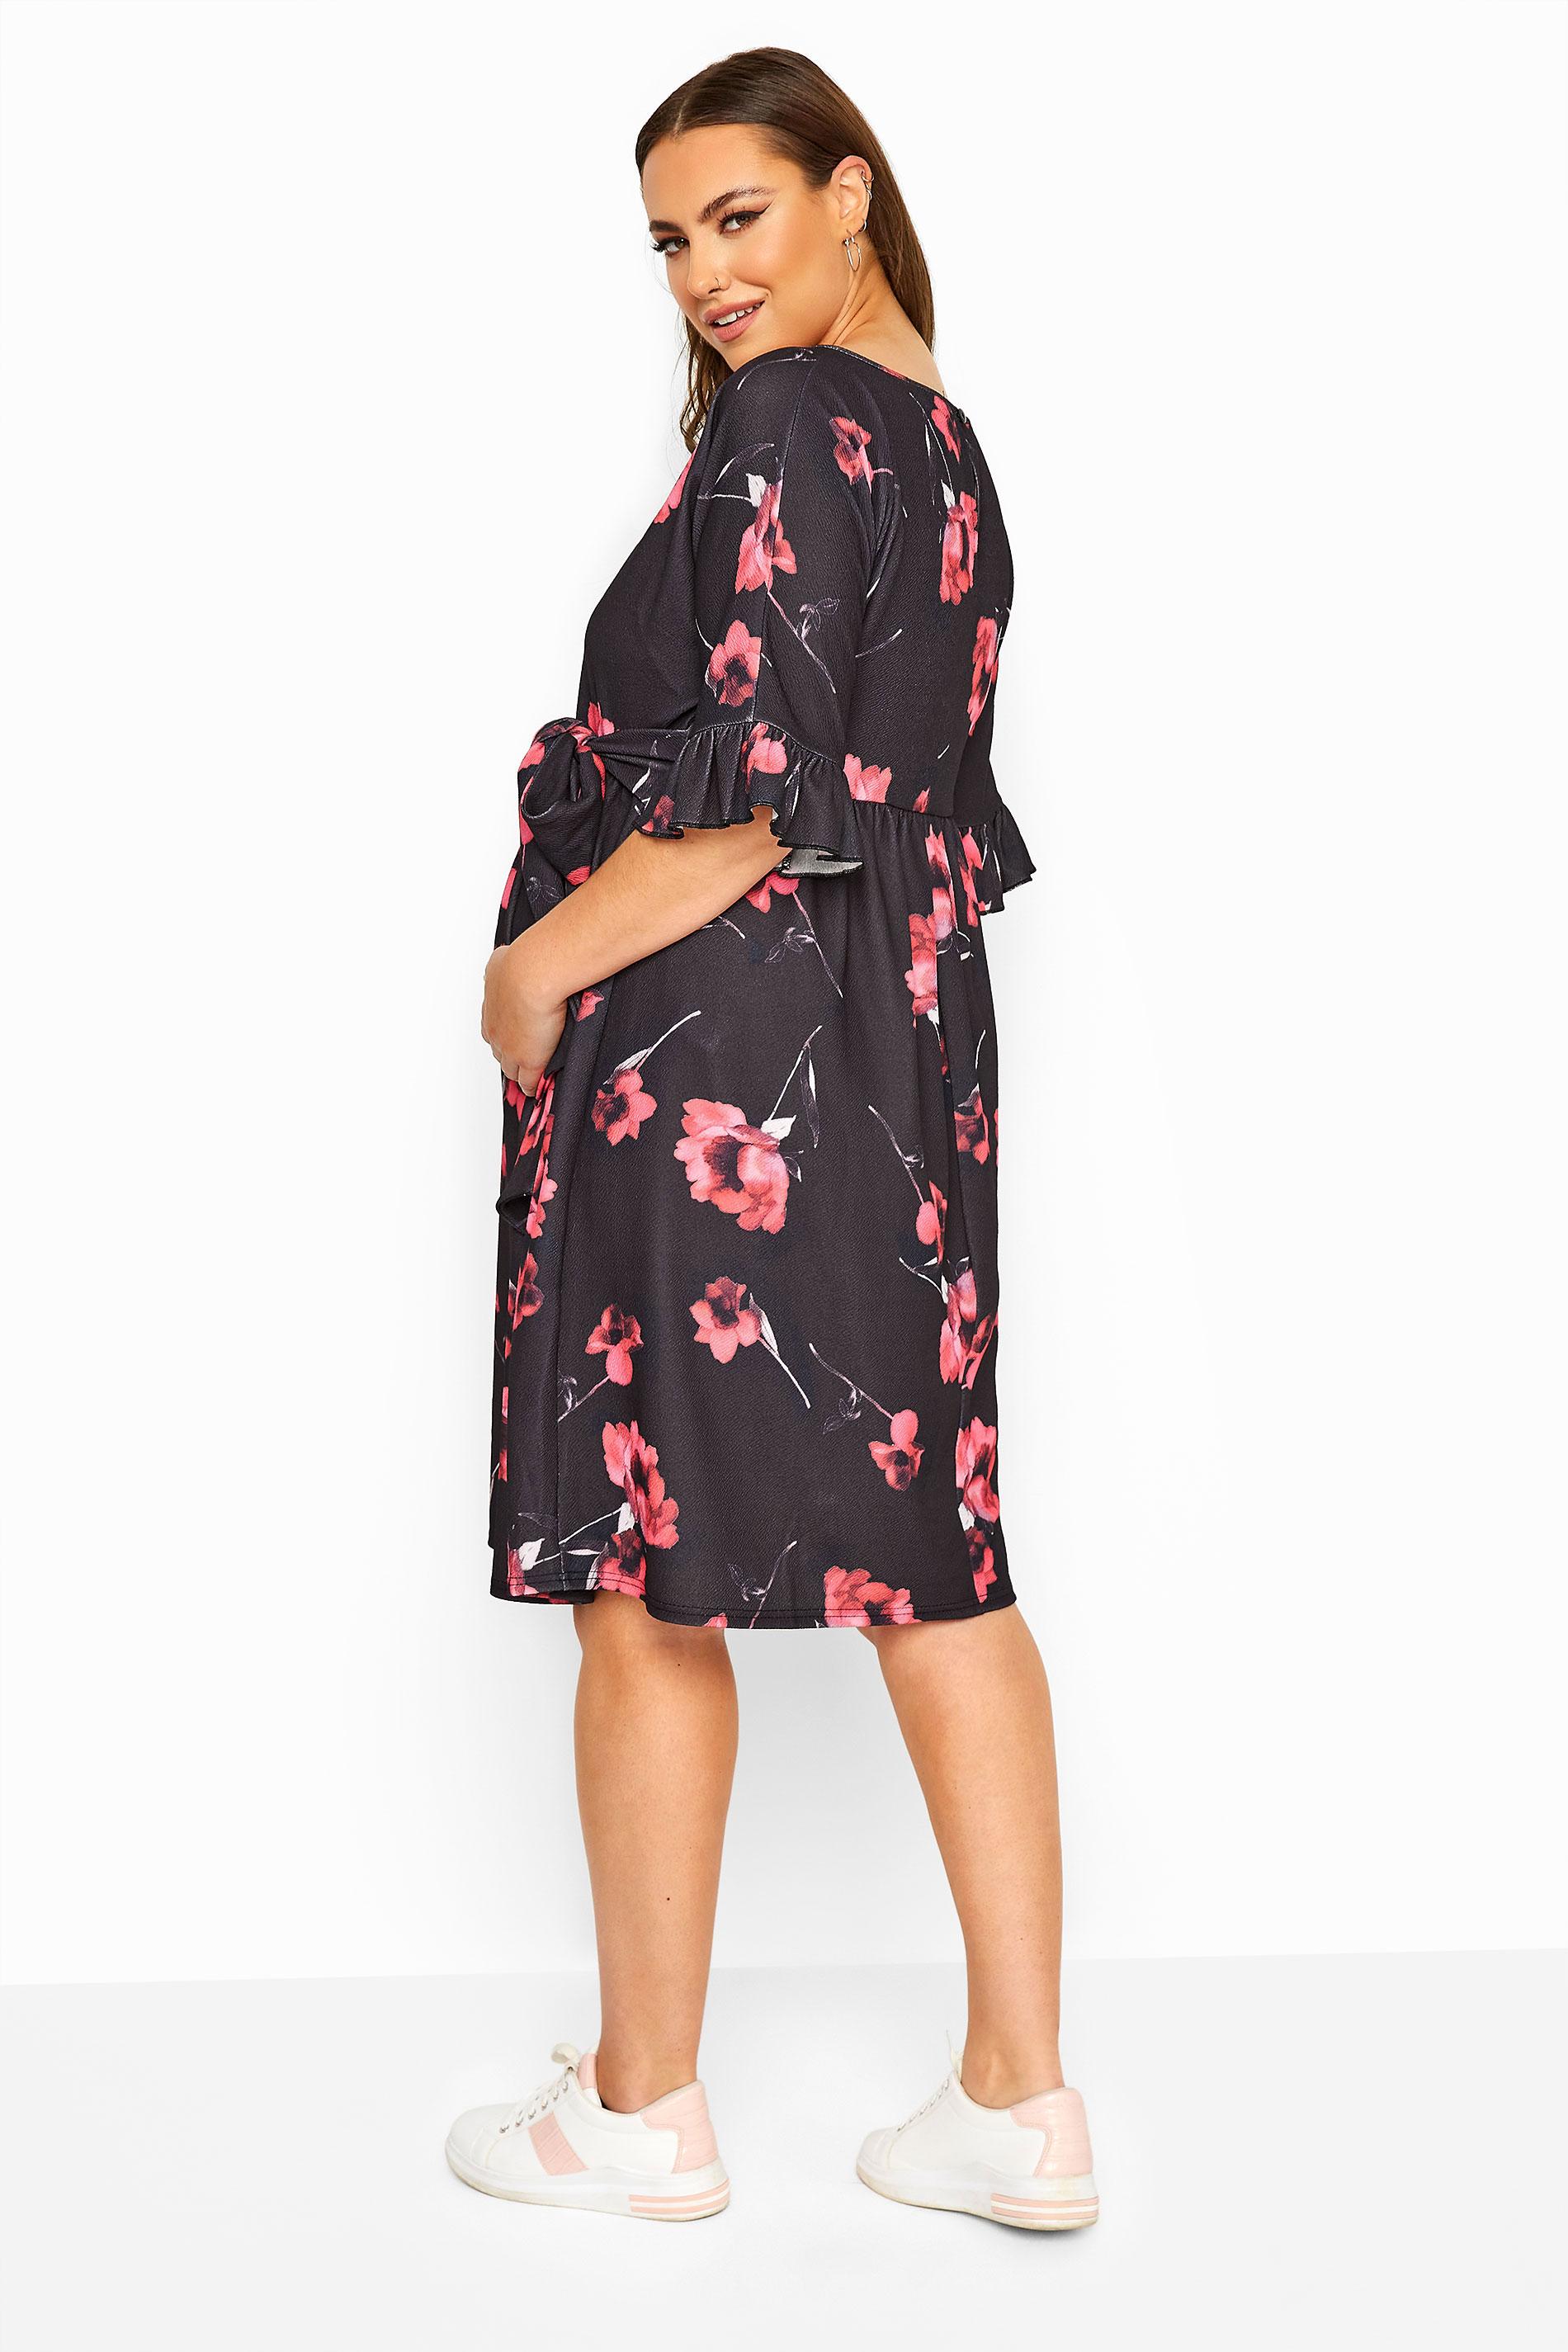 Bump It Up Black 3//4 Sleeves Wrap Maternity Dress Plus Size 18 to 24 BNWT